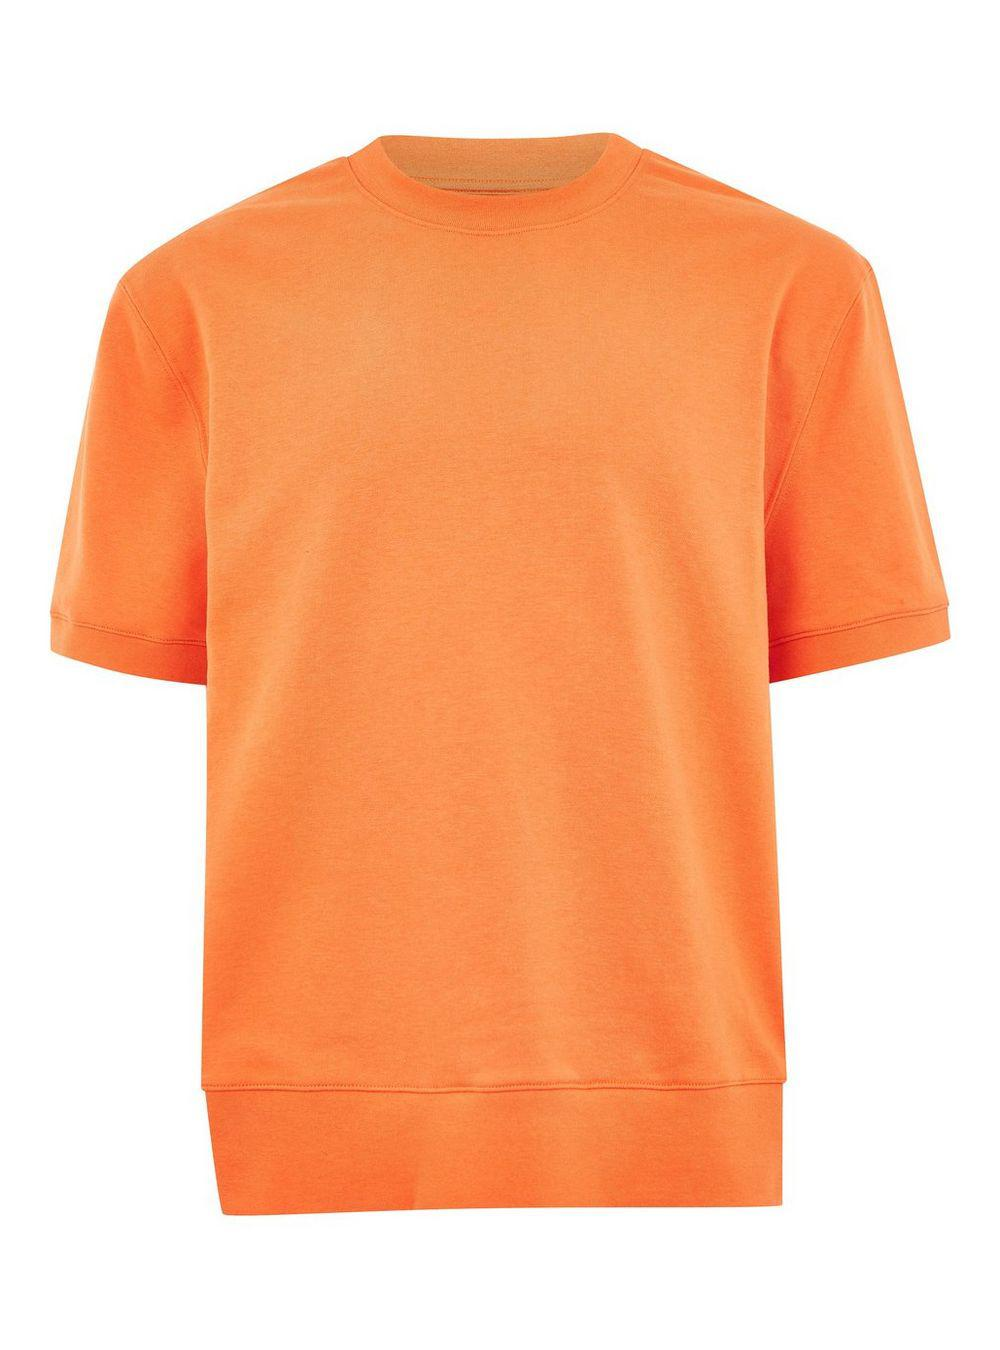 aed9b262 Topman - Orange Short Sleeve Sweatshirt for Men - Lyst. View fullscreen